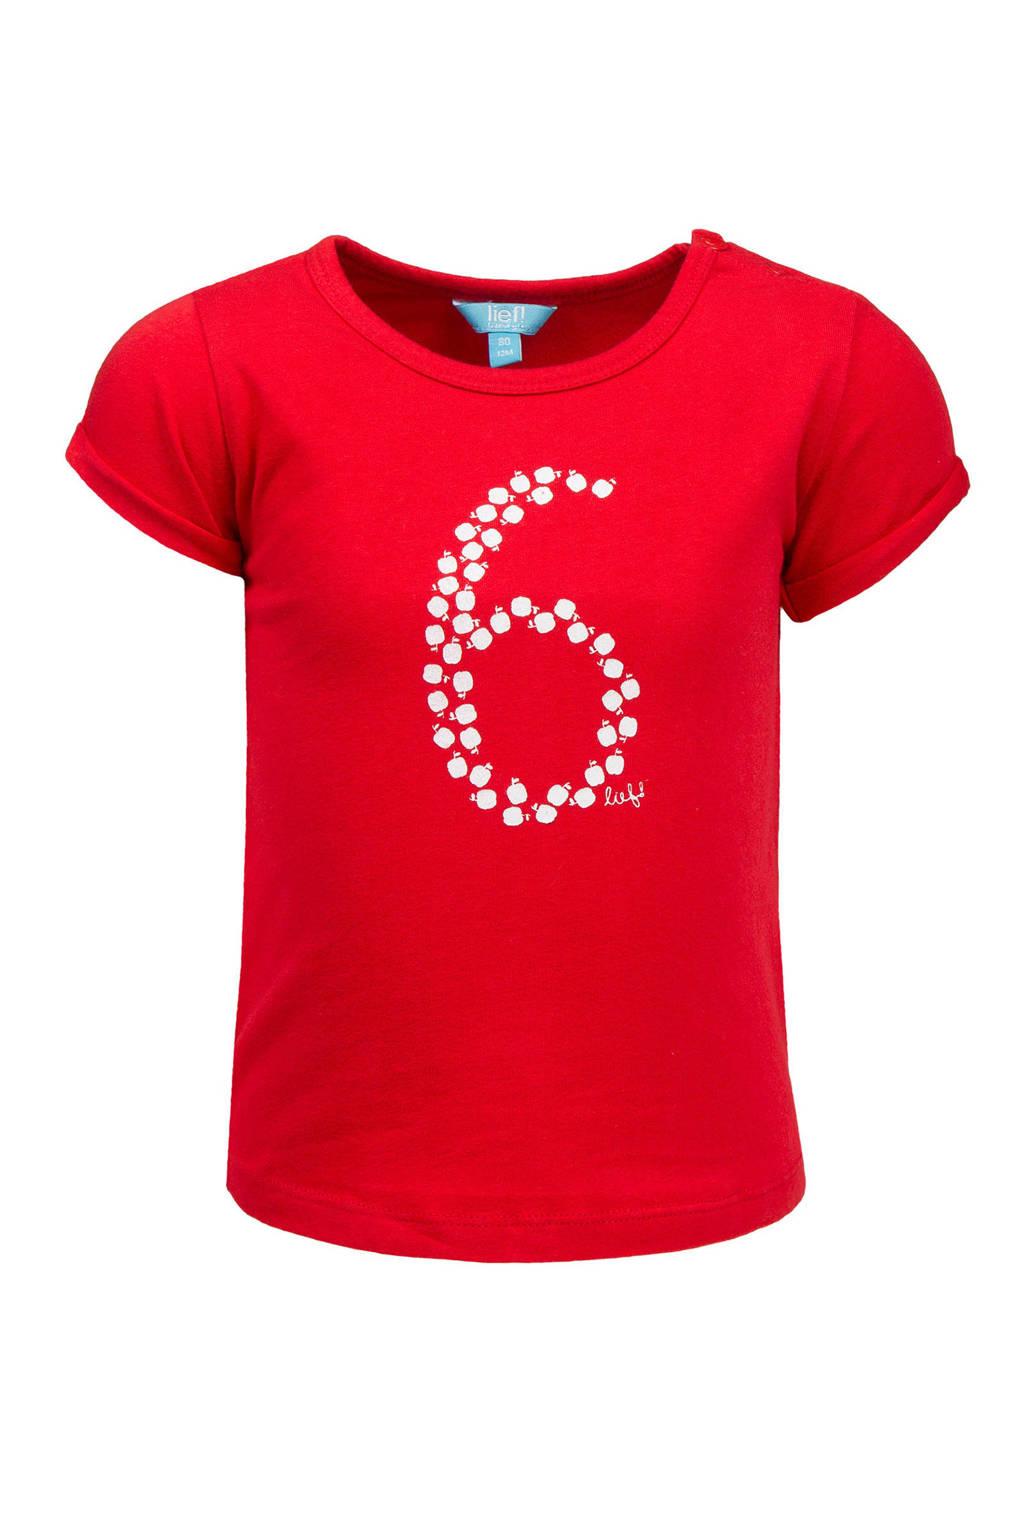 lief! T-shirt met print felrood, Felrood